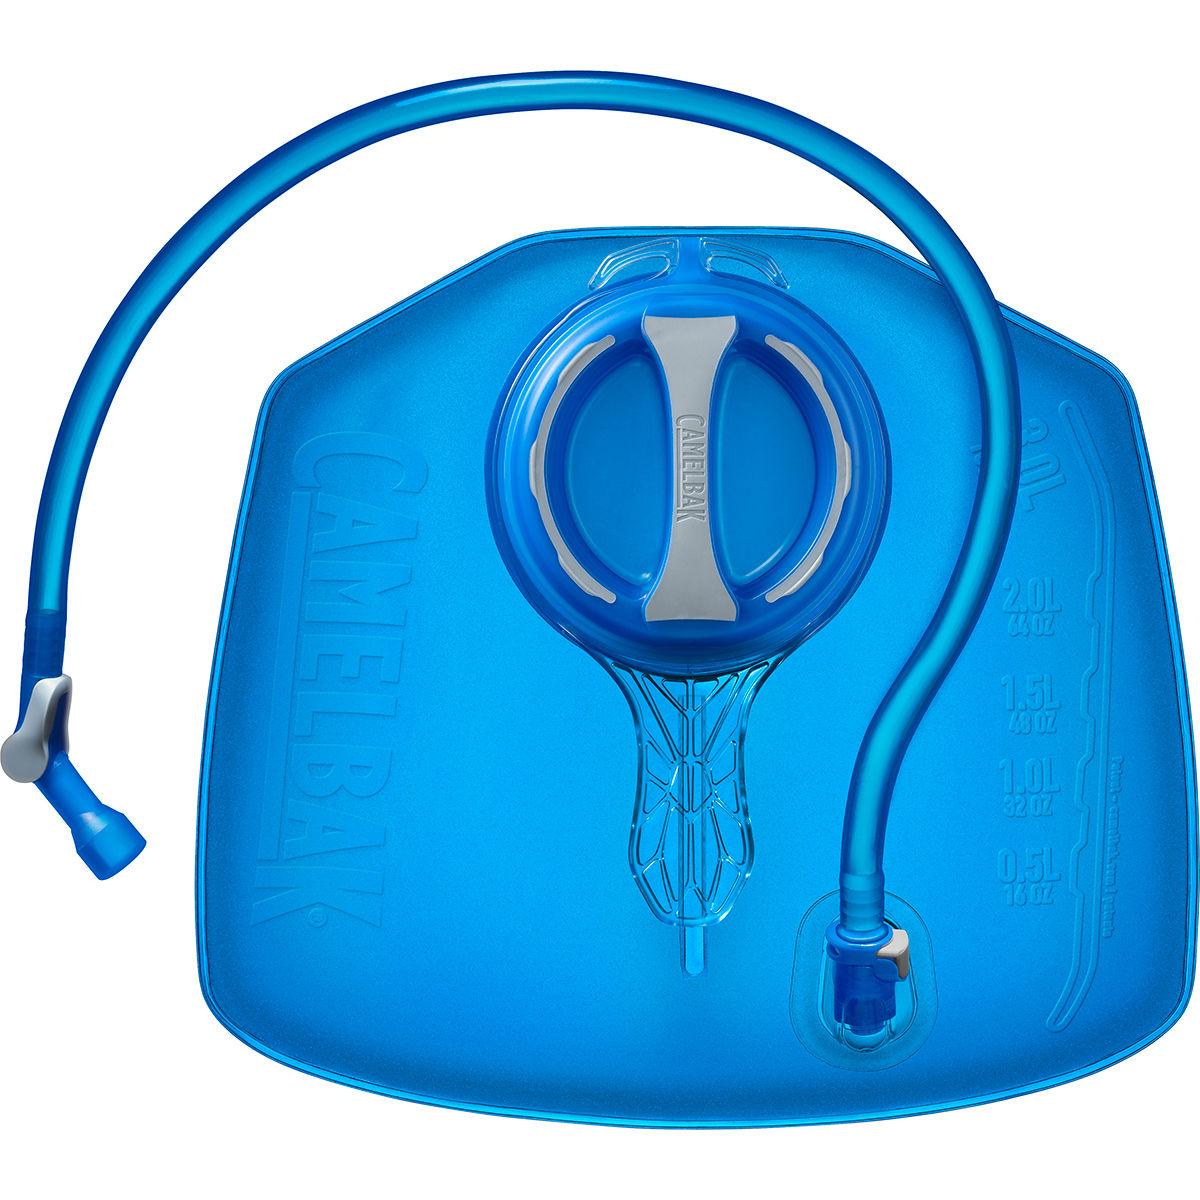 photo: CamelBak Crux Lumbar 100 hydration reservoir